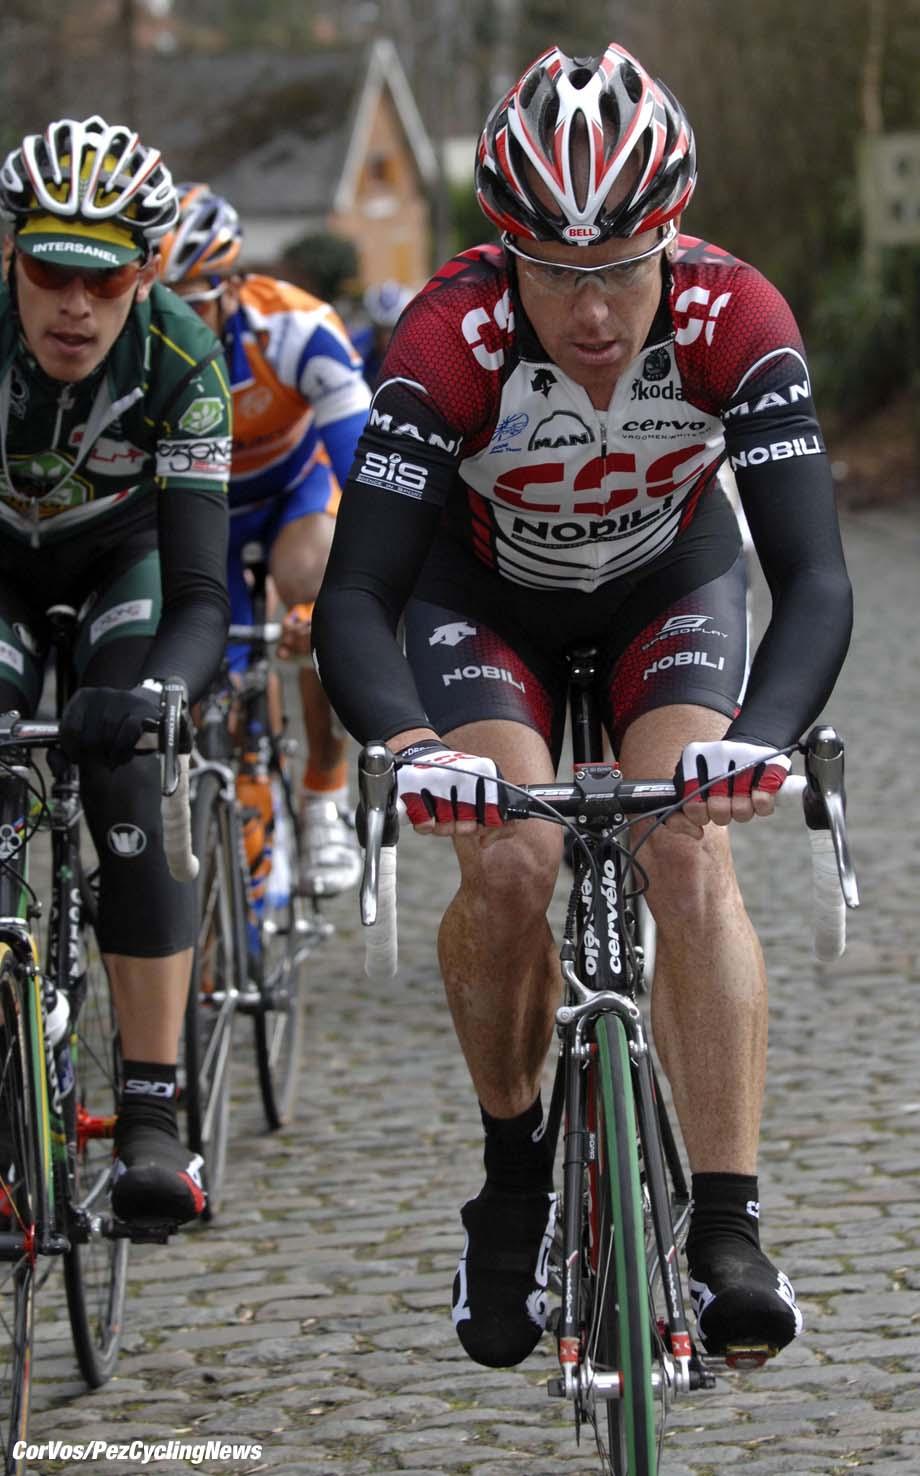 Kuurne - wielrennen - cycling - cyclisme - radsport - Kuurne-Brussel-Kuurne - Stuart O'Grady (CSC)- foto Cor Vos ©2007